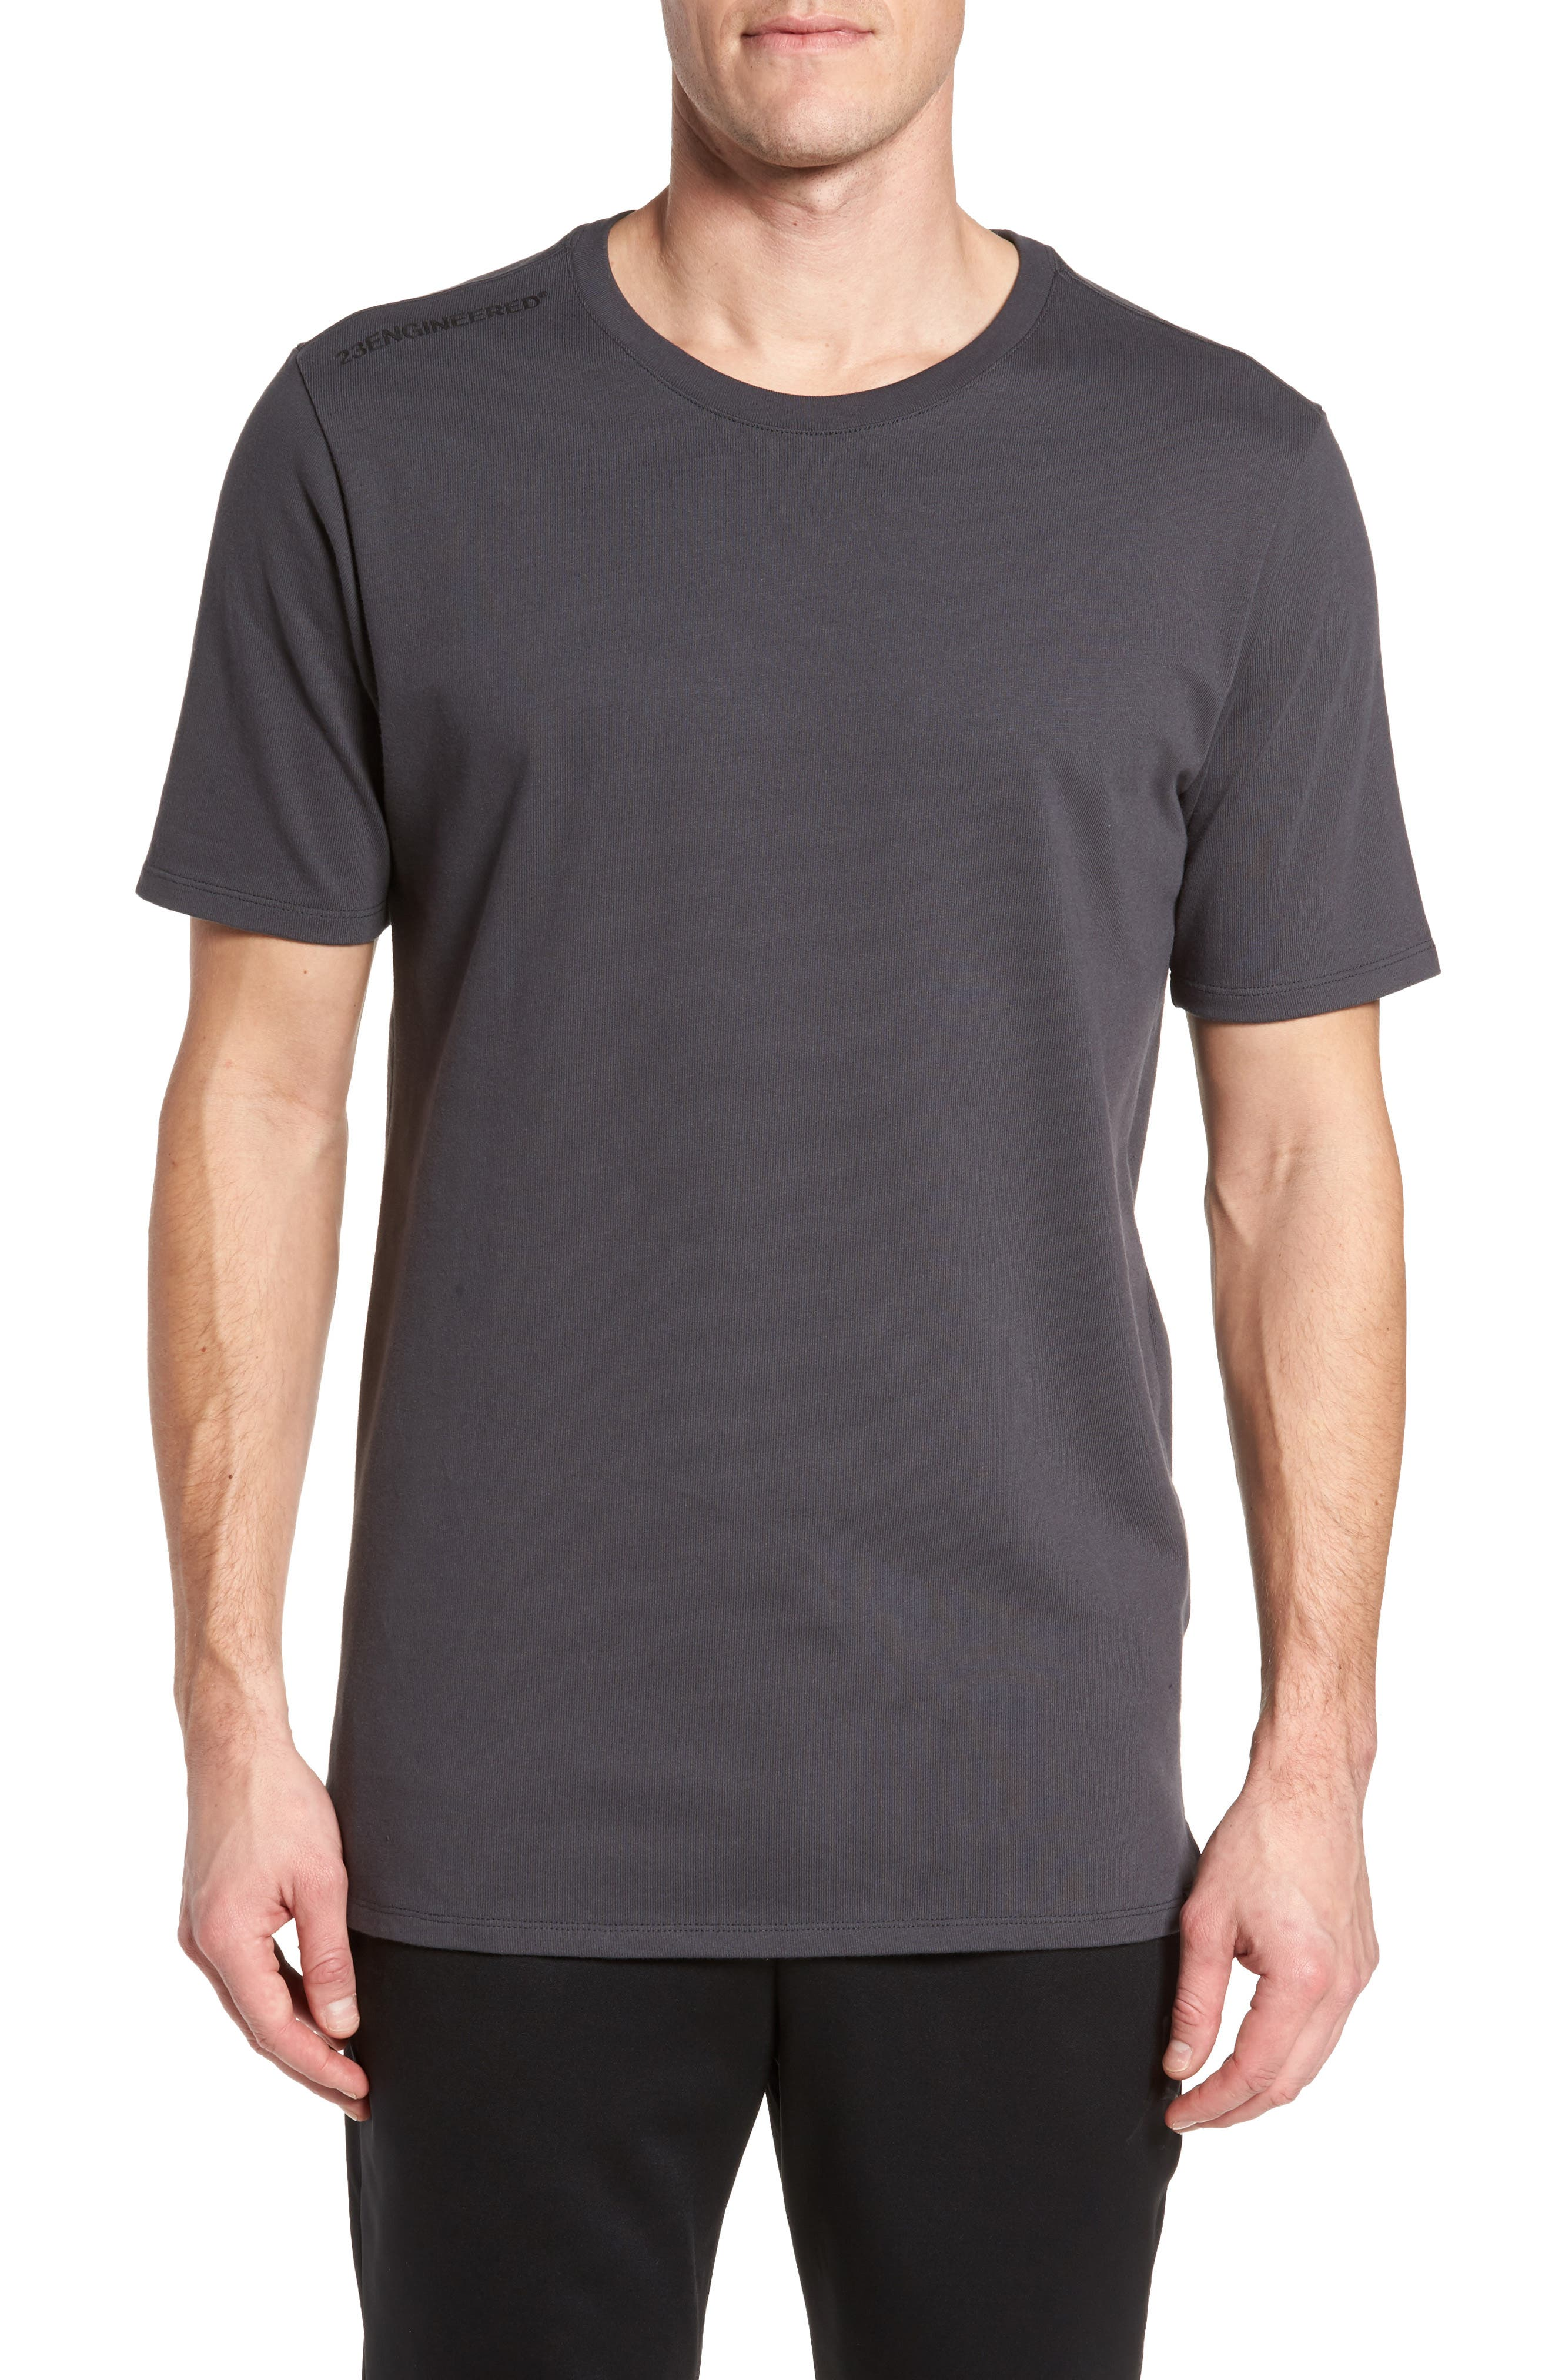 Sportswear 23 Engineered T-Shirt,                             Main thumbnail 1, color,                             060